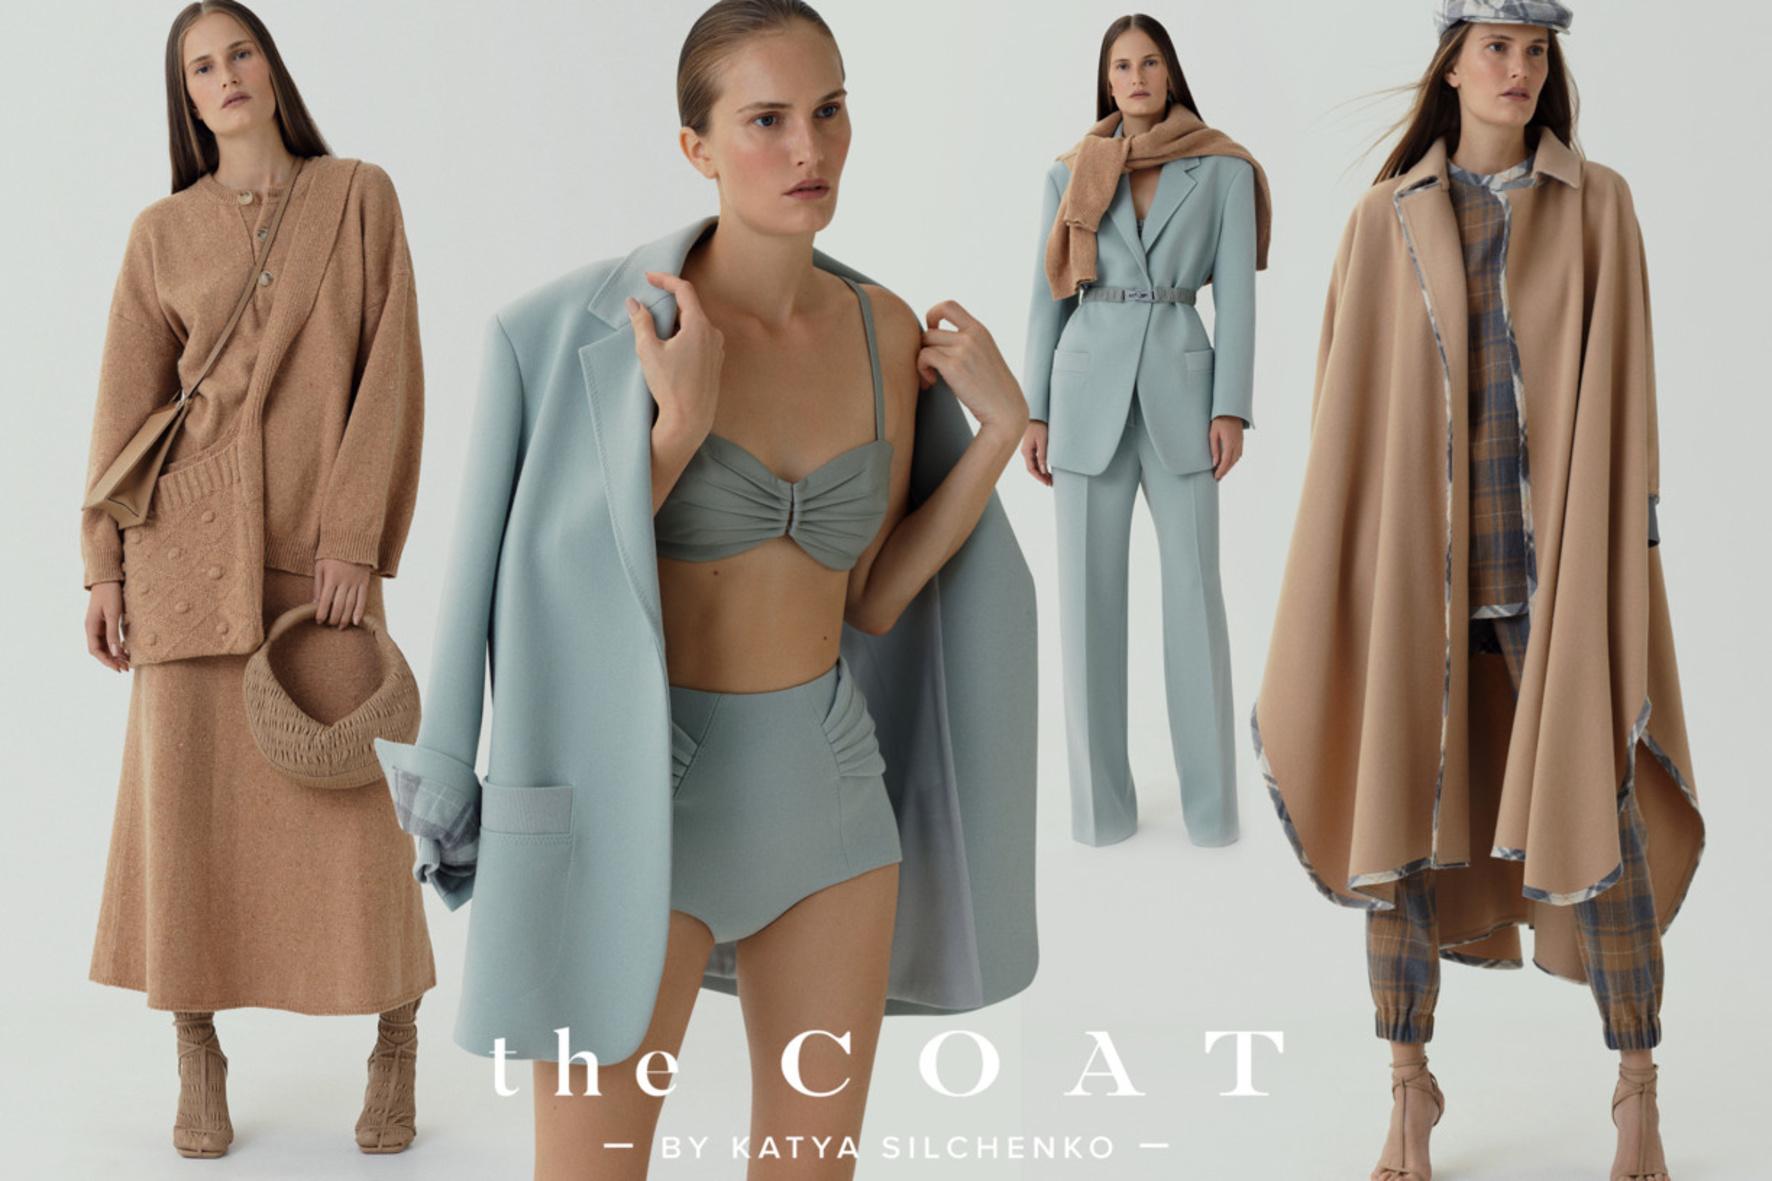 Коллекция осень-зима 2021/22' бренда the COAT by Katya Silchenko